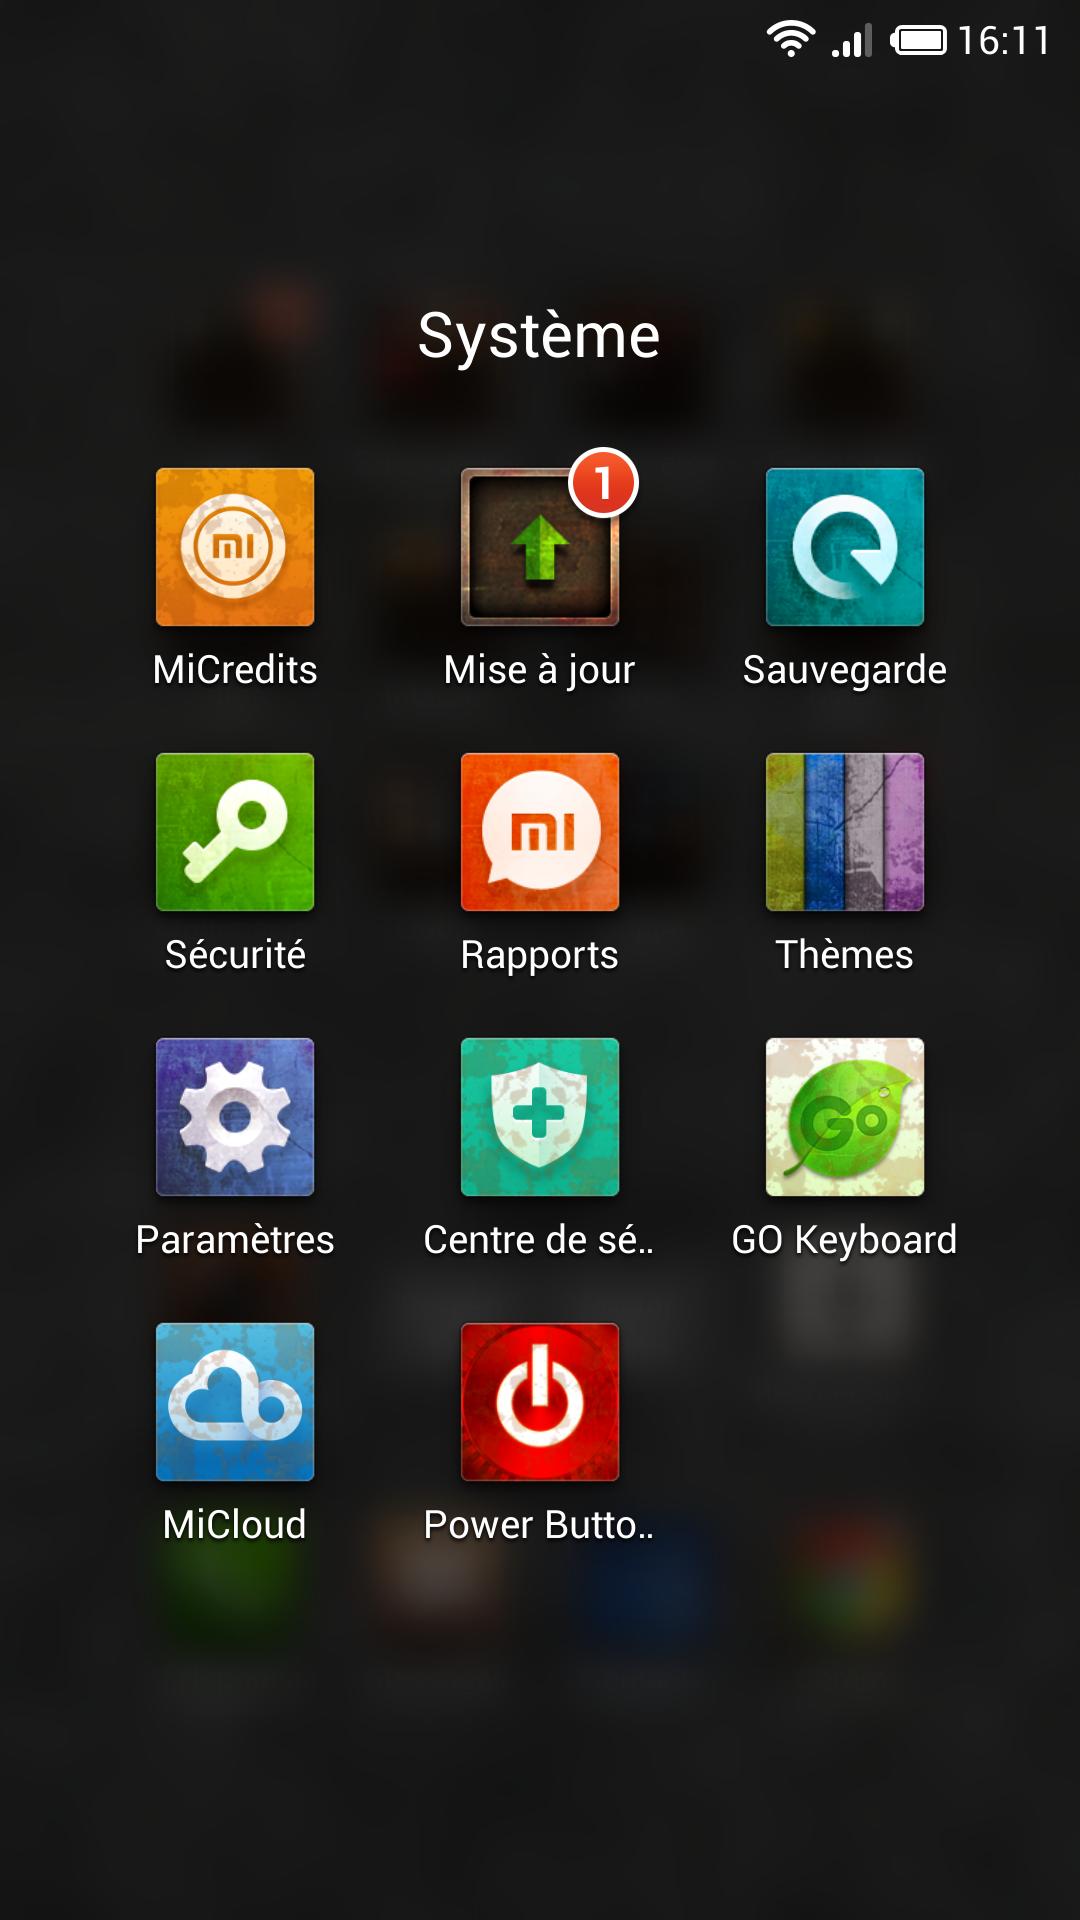 [TUTO]jBART : Traduire une ROM ou certaines des applications 487066Screenshot201406161611071